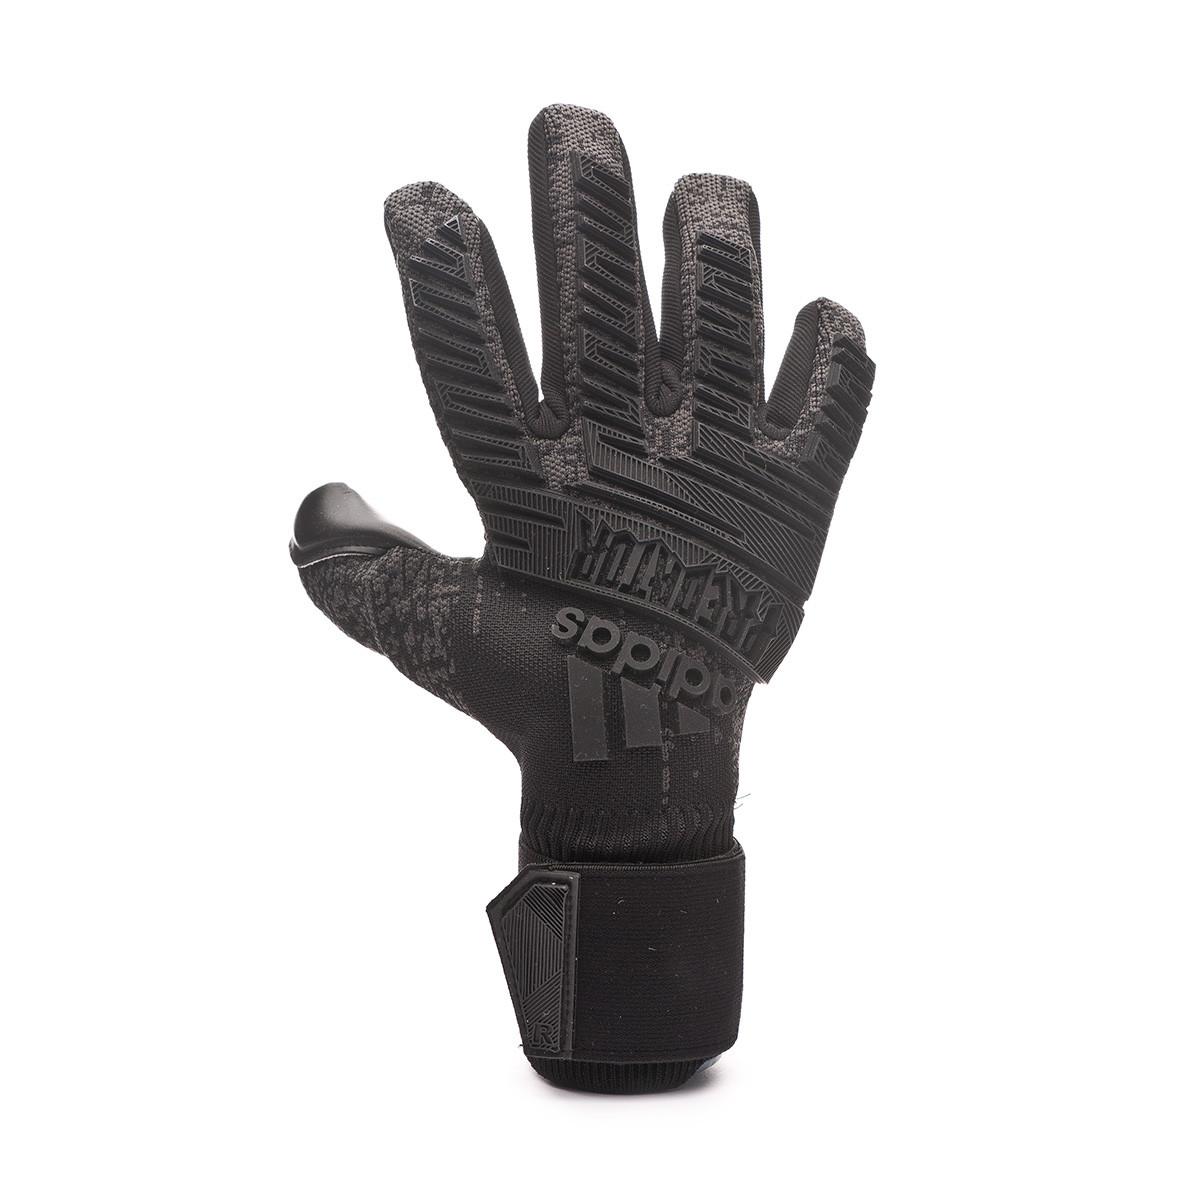 apilar tonto Aprobación  Glove adidas Predator Pro Utility black - Football store Fútbol Emotion